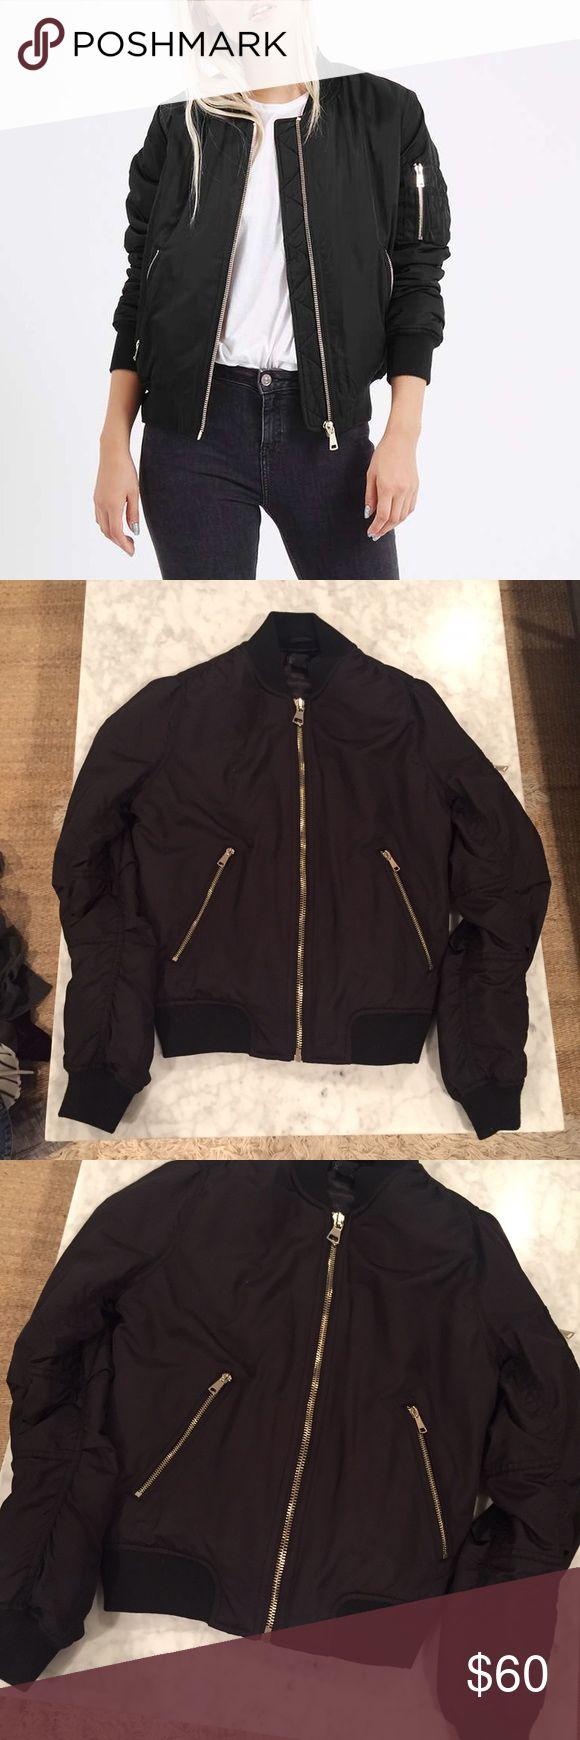 Topshop Black Bomber Jacket Topshop black bomber jacket! Size us 2! 🚫NO TRADES🚫 Topshop Jackets & Coats